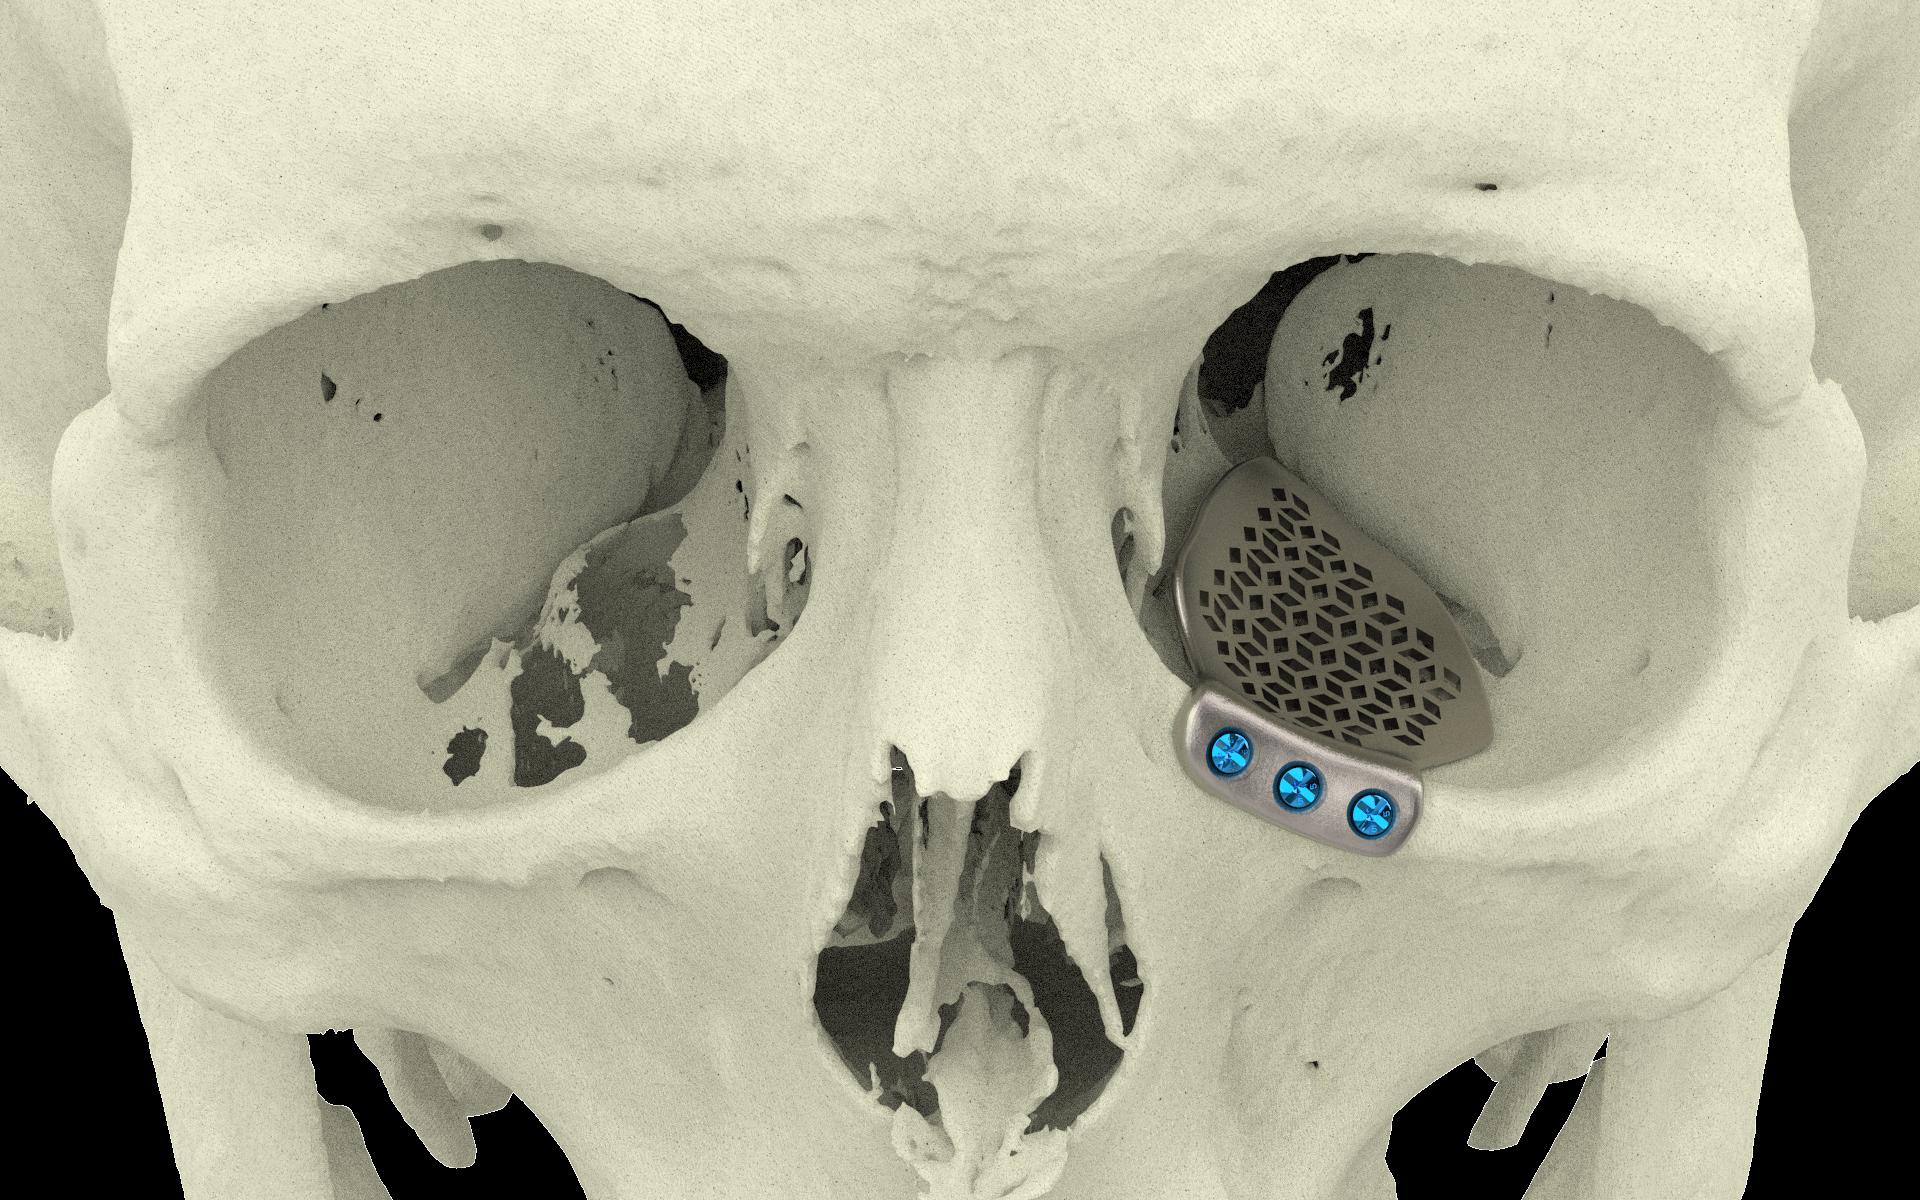 Orbital Floor | Xilloc